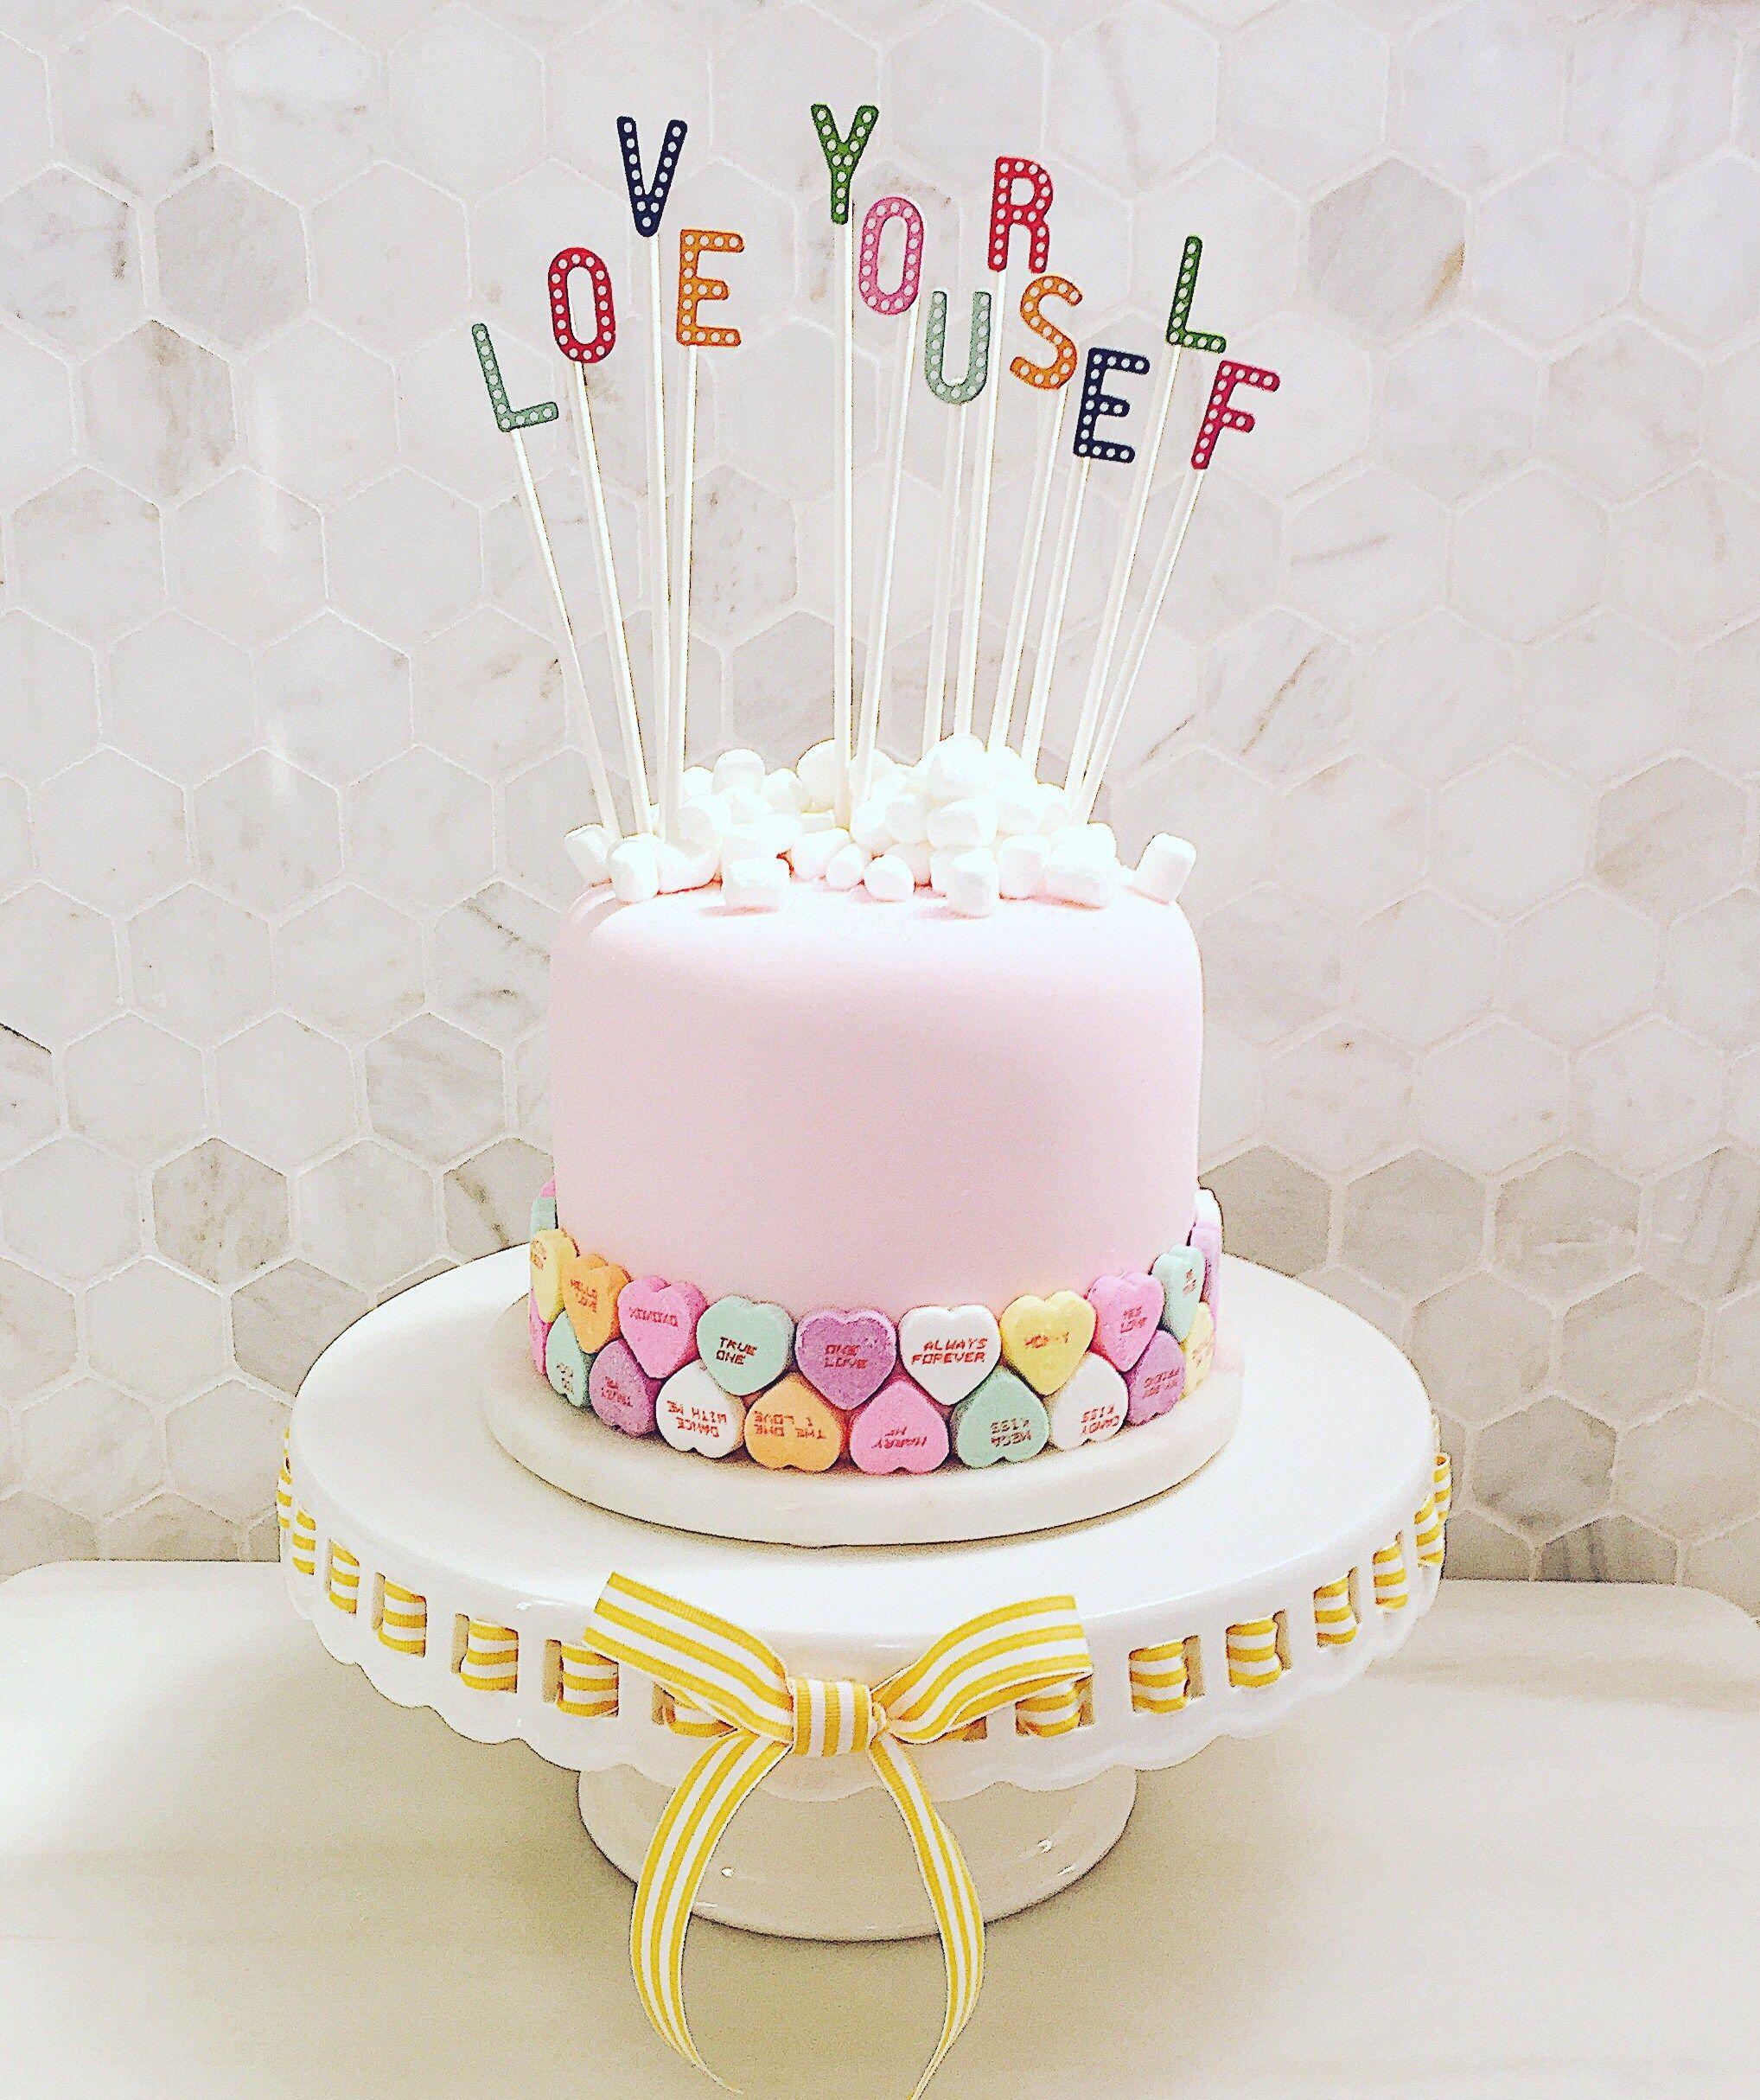 Incredible Easy Pound Cake Recipe Homemade Pound Cake Cute Birthday Funny Birthday Cards Online Inifodamsfinfo